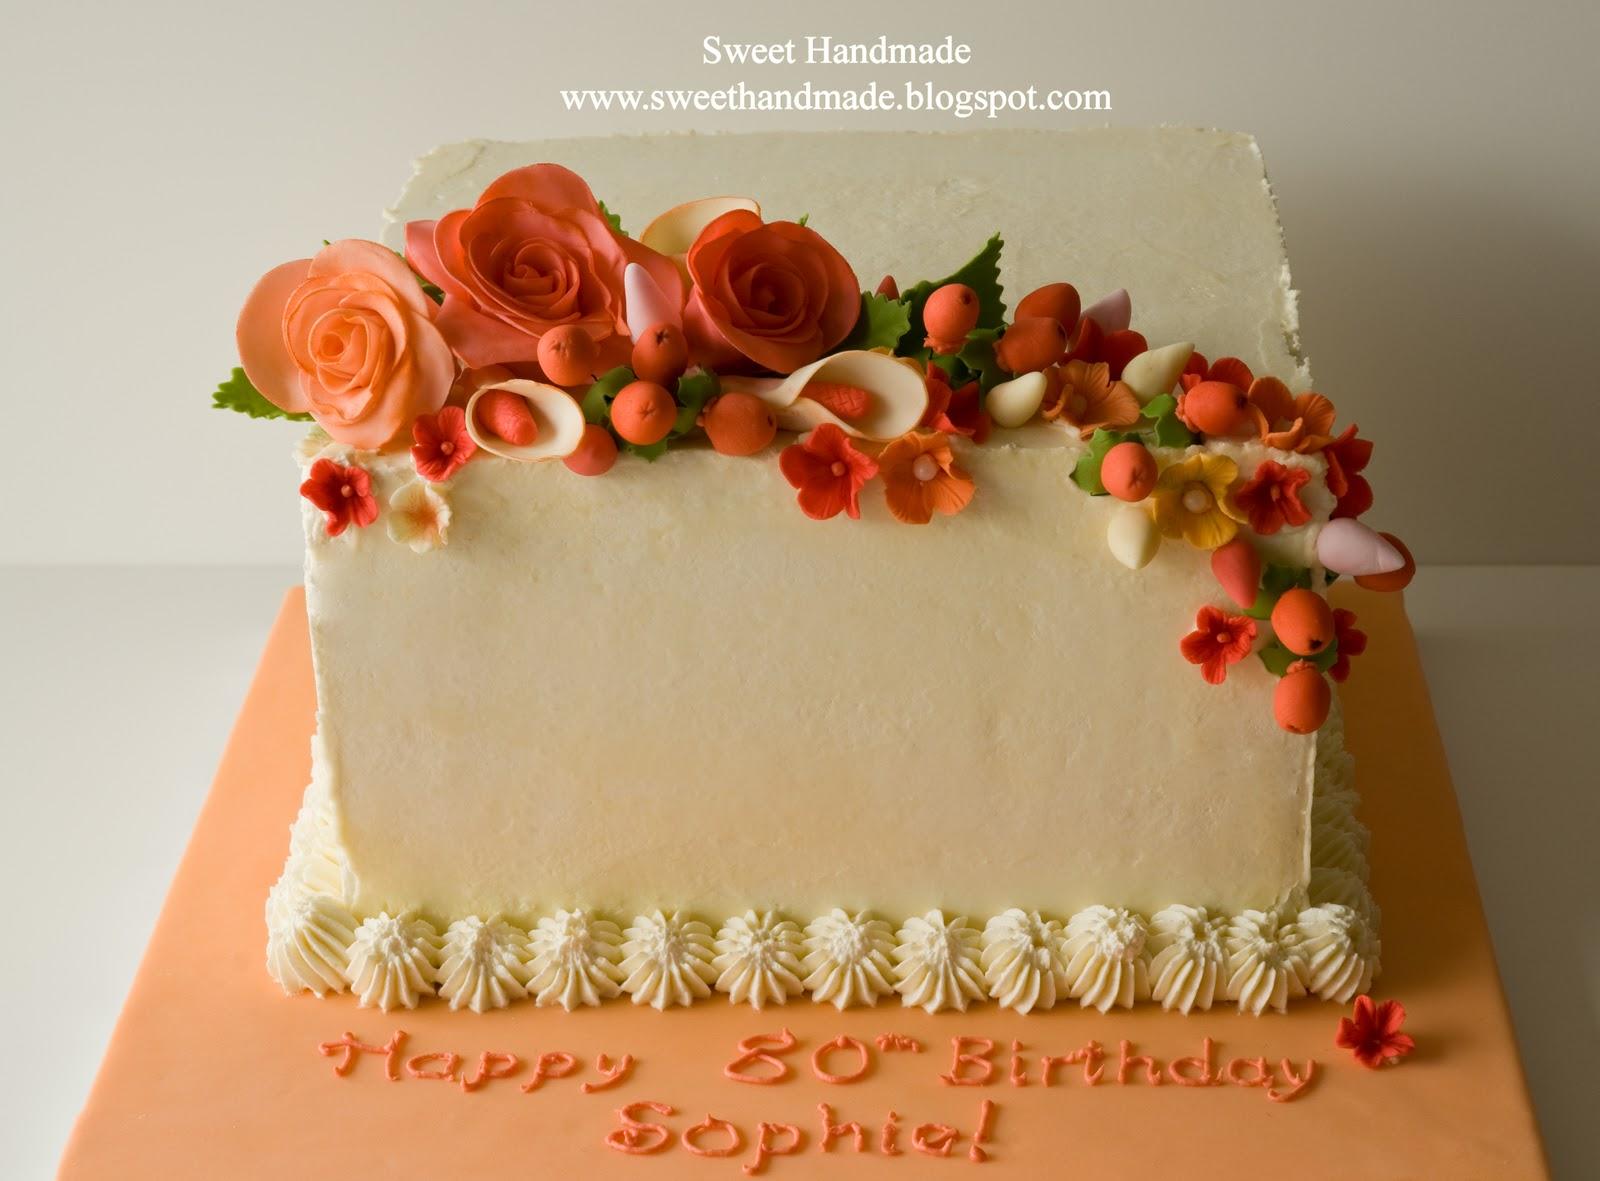 Sweet Handmade Cookies 80th Birthday Cake With Gum Paste Flowers